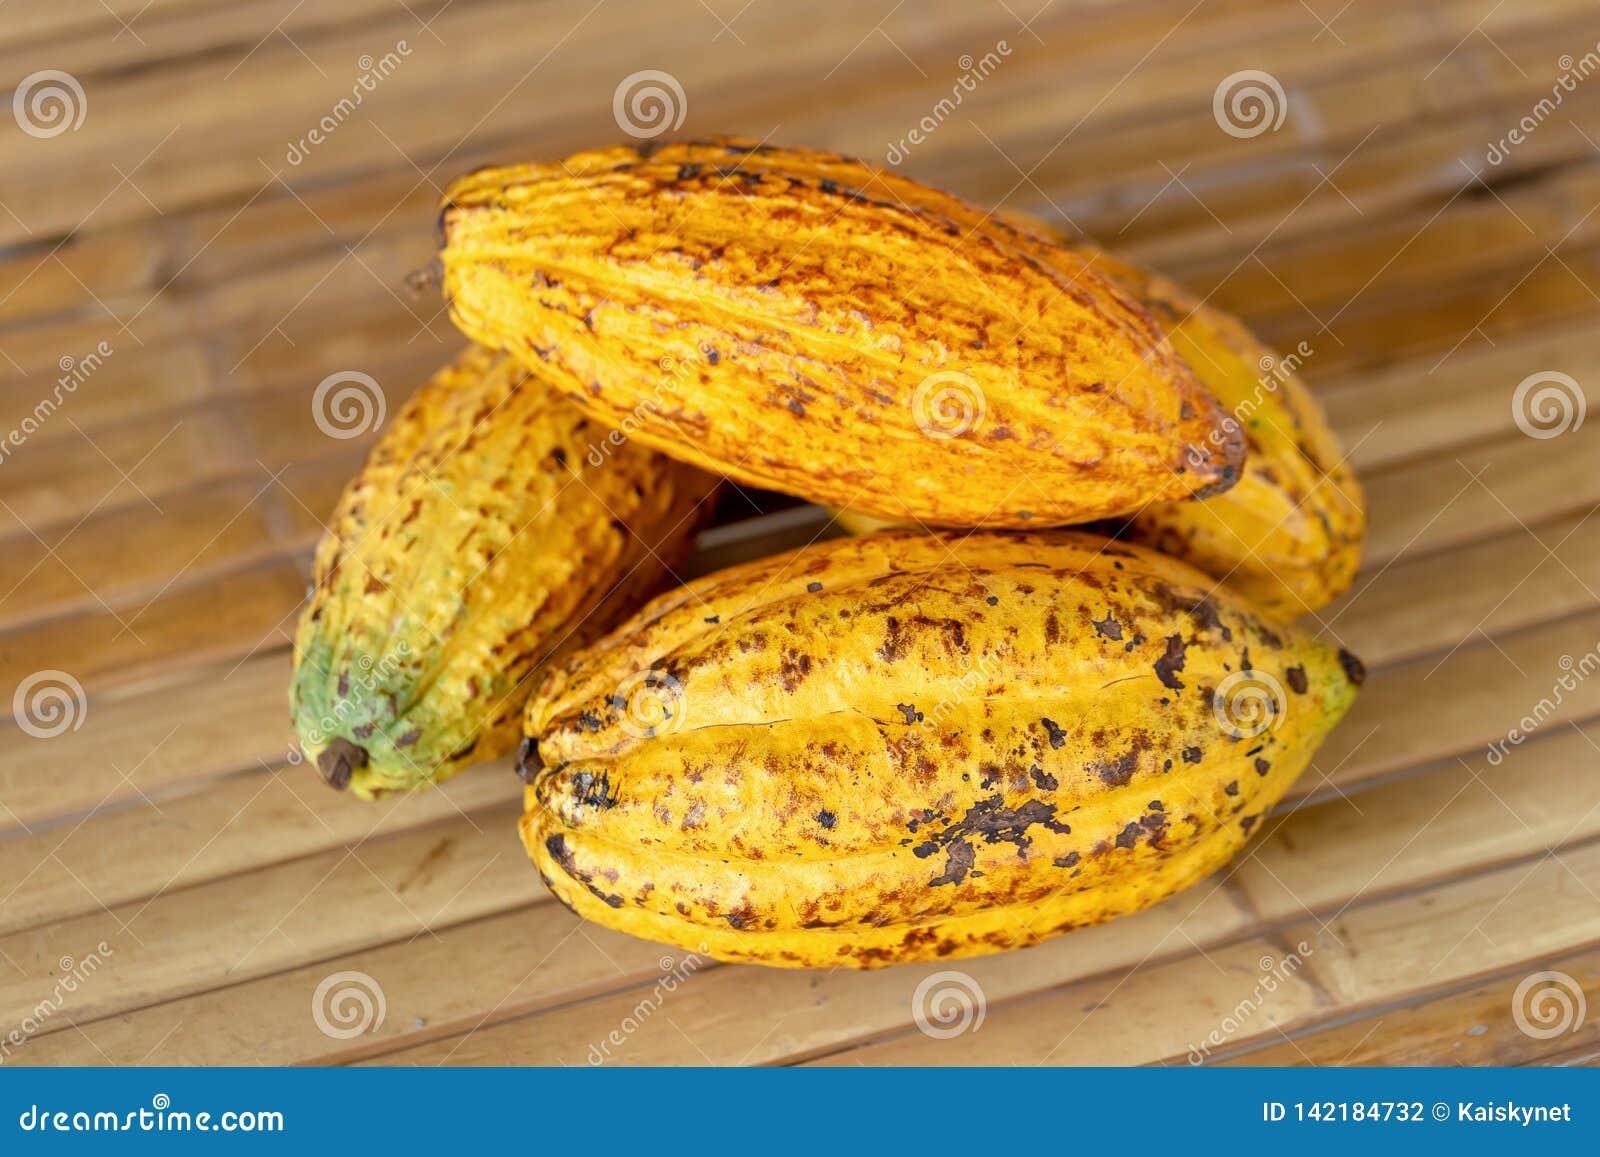 Fruit de cacao, haricots crus de cacao et fond de cosse de cacao